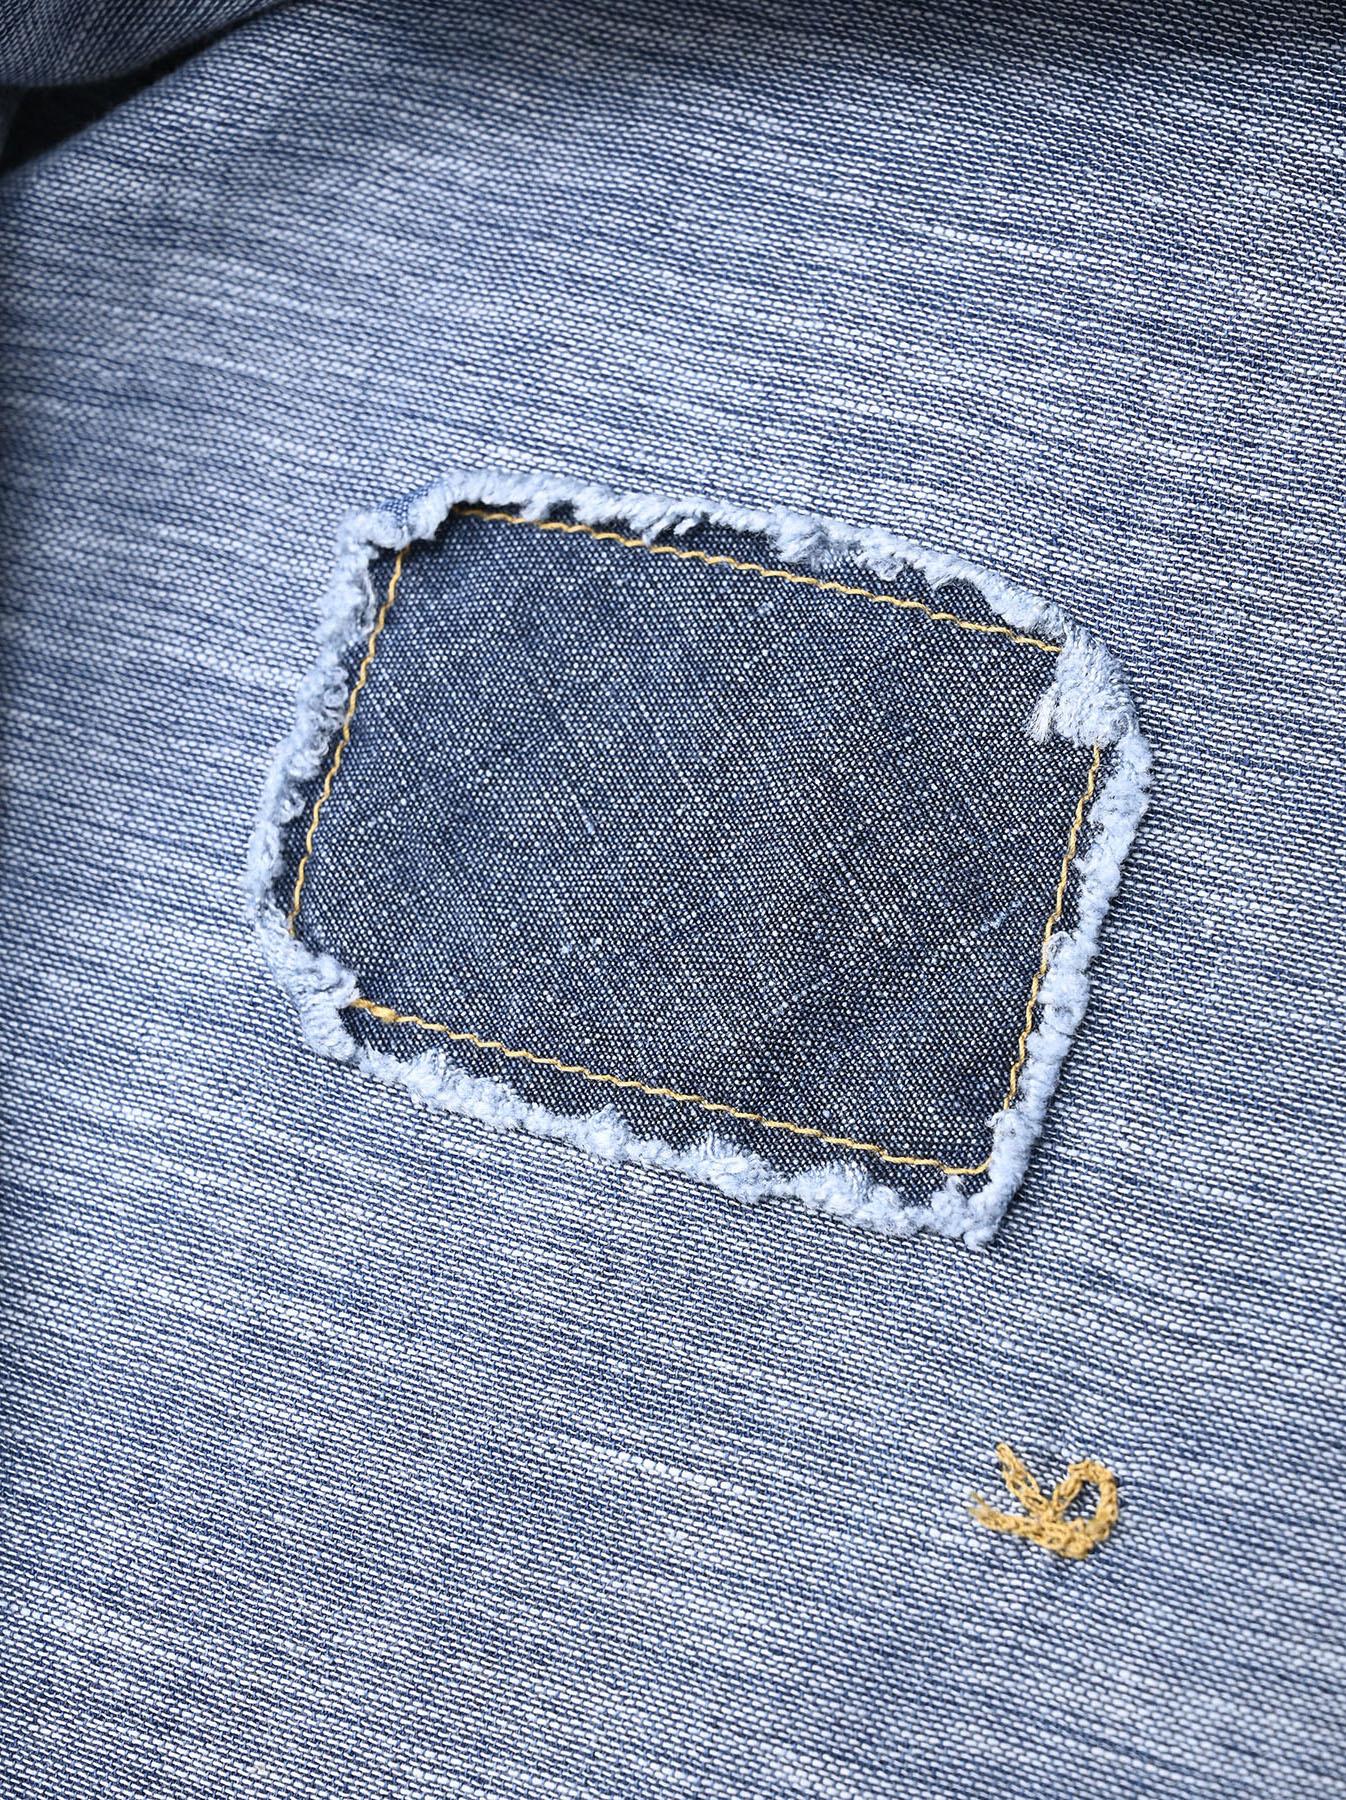 Indigo Gauze 908 Ocean Shirt Distressed-12